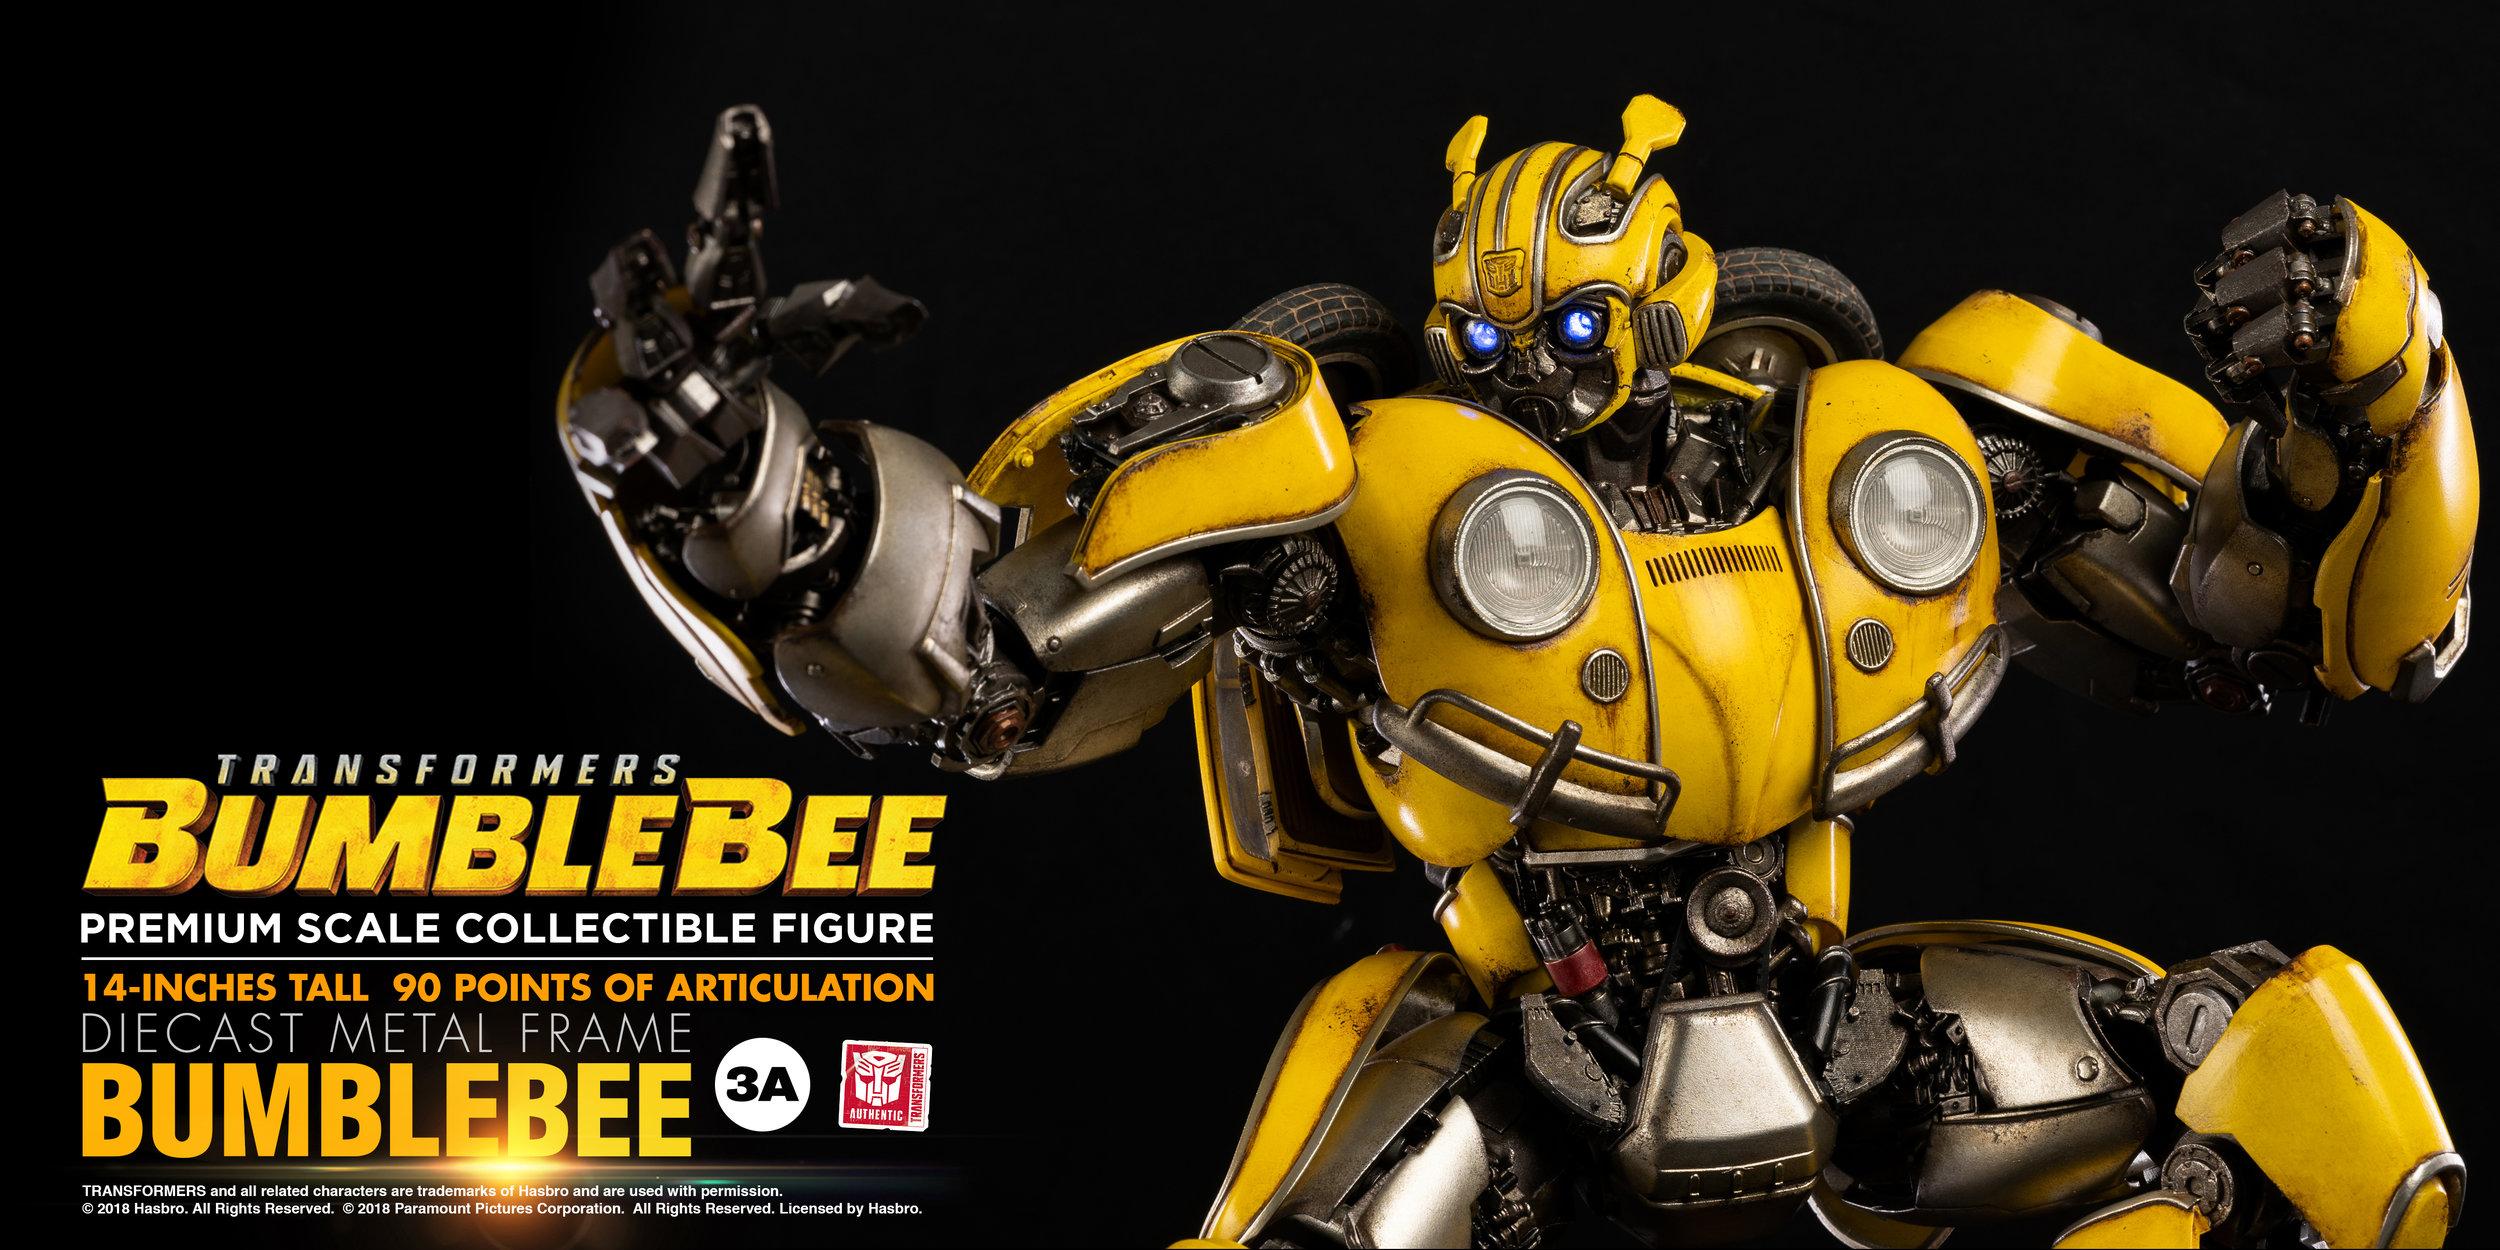 Bumblebee_ENG_PM_WIDE_004.jpg